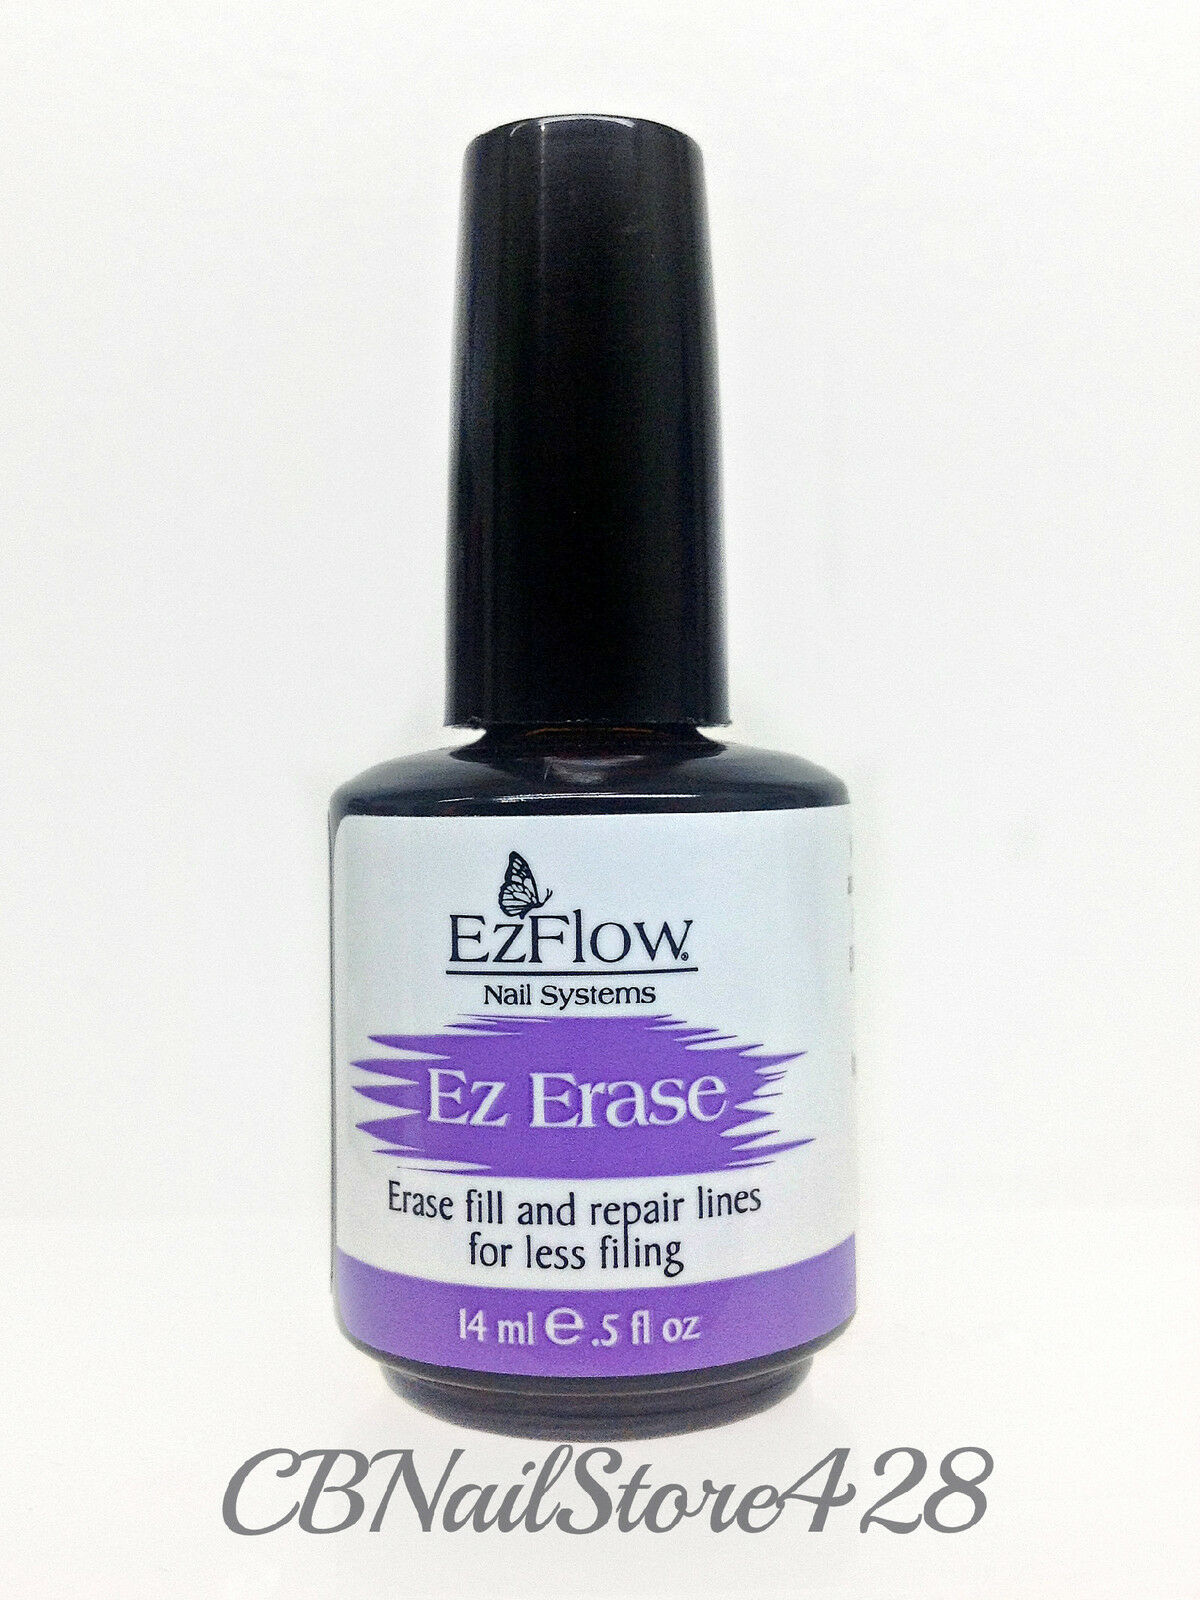 EzFlow Nail Systems- EZ Erase 0.5oz/14ml Ship in 24h | eBay